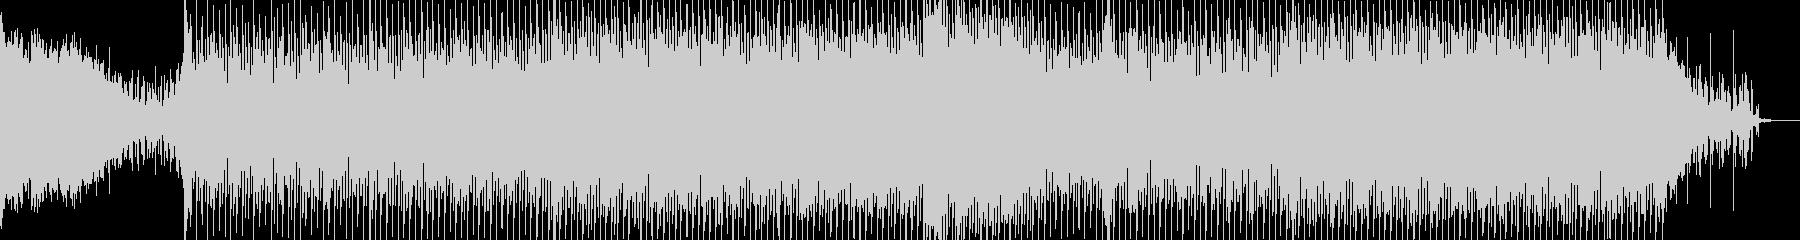 EDMポップで明るいクラブ系-120の未再生の波形